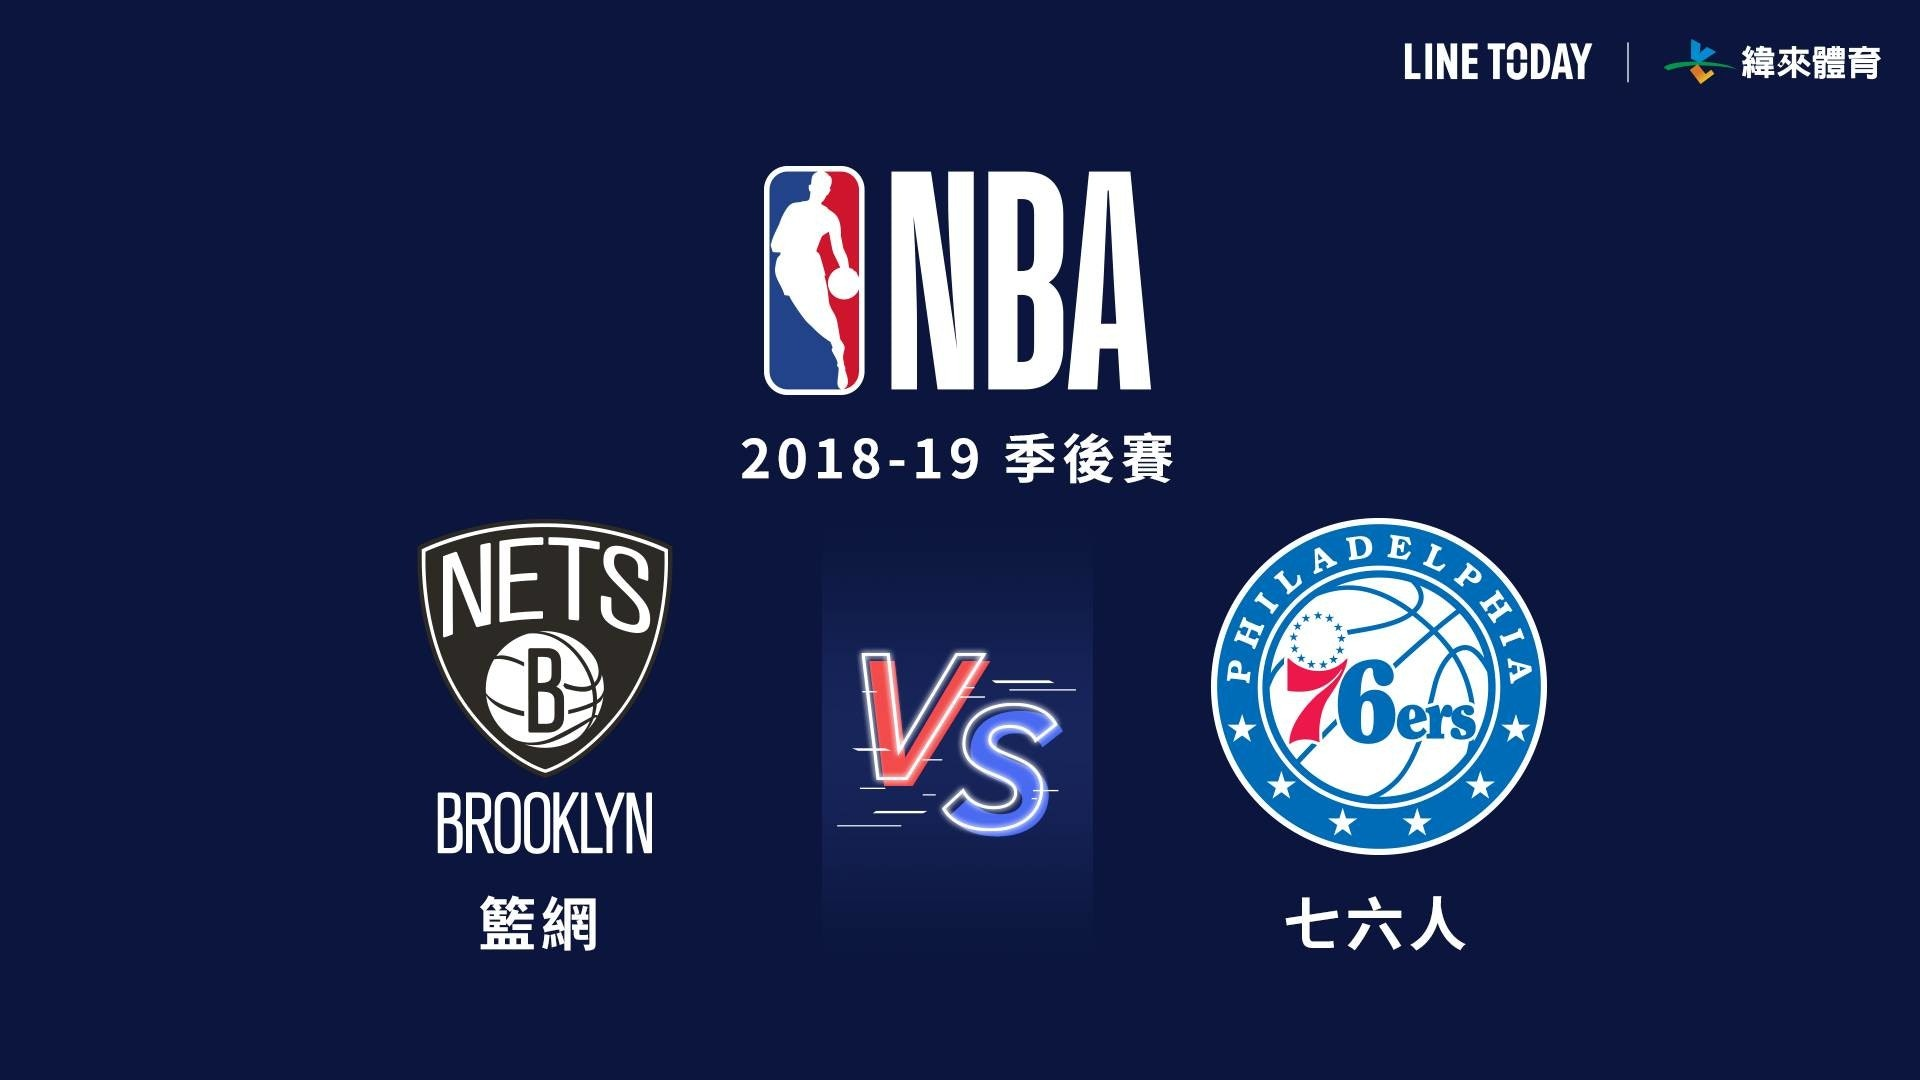 NBA, Oklahoma City Thunder, Dallas Mavericks, Brooklyn Nets, Los Angeles Lakers, Toronto Raptors, Houston Rockets, Utah Jazz, New York Knicks, Philadelphia 76ers, nba, Logo, Font, Emblem, Brand, Graphics, Trademark, Label, Symbol